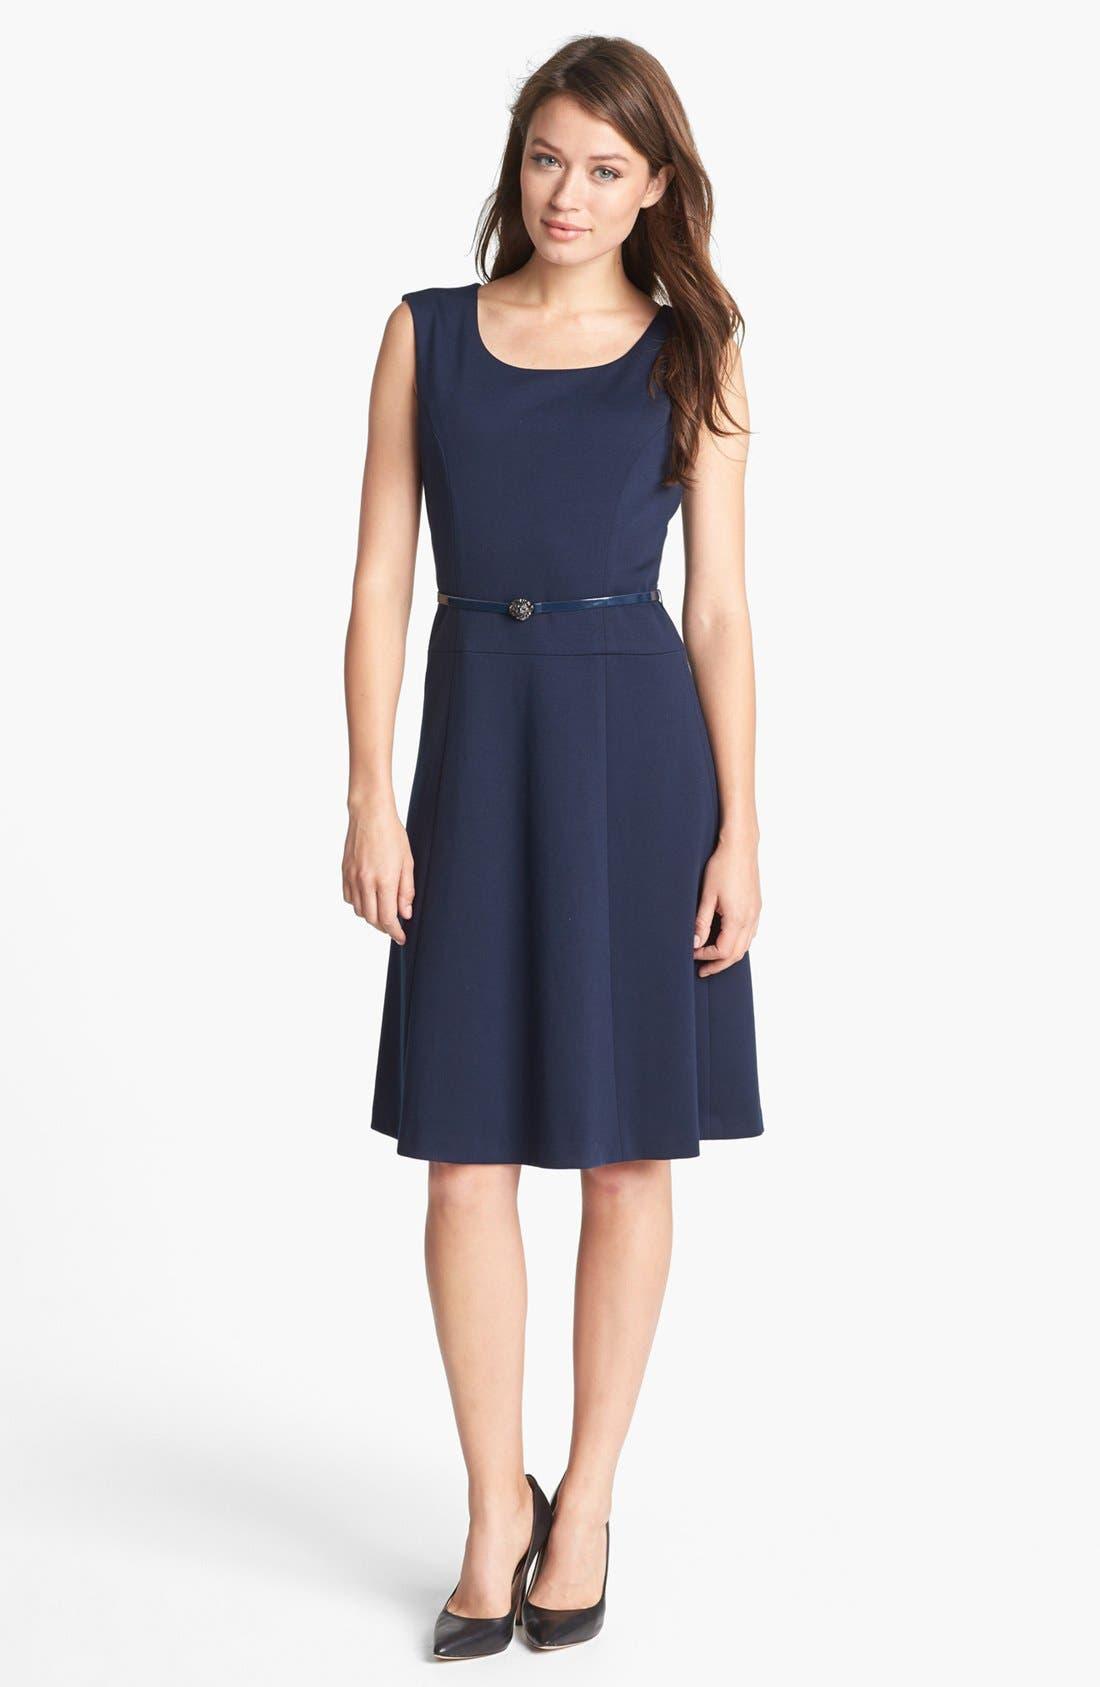 Alternate Image 1 Selected - Anne Klein Belted Fit & Flare Dress